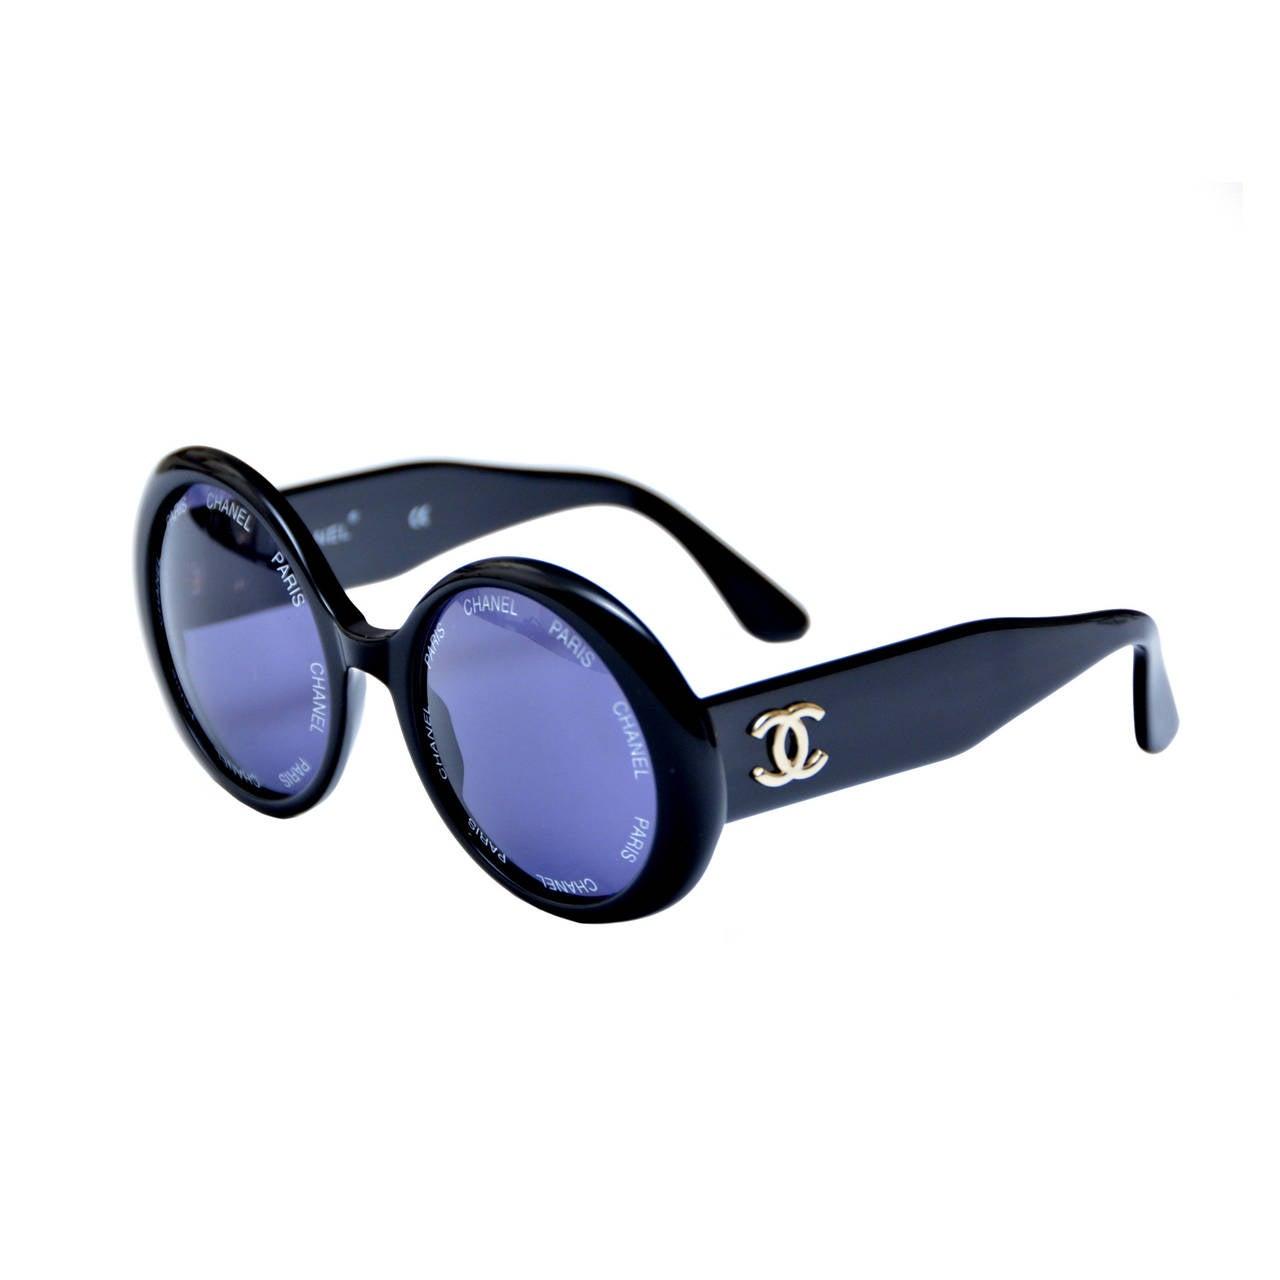 "Chanel Vintage Rare  ""CHANEL PARIS"" Sunglasses As Seen On Rihana  MINT 1"